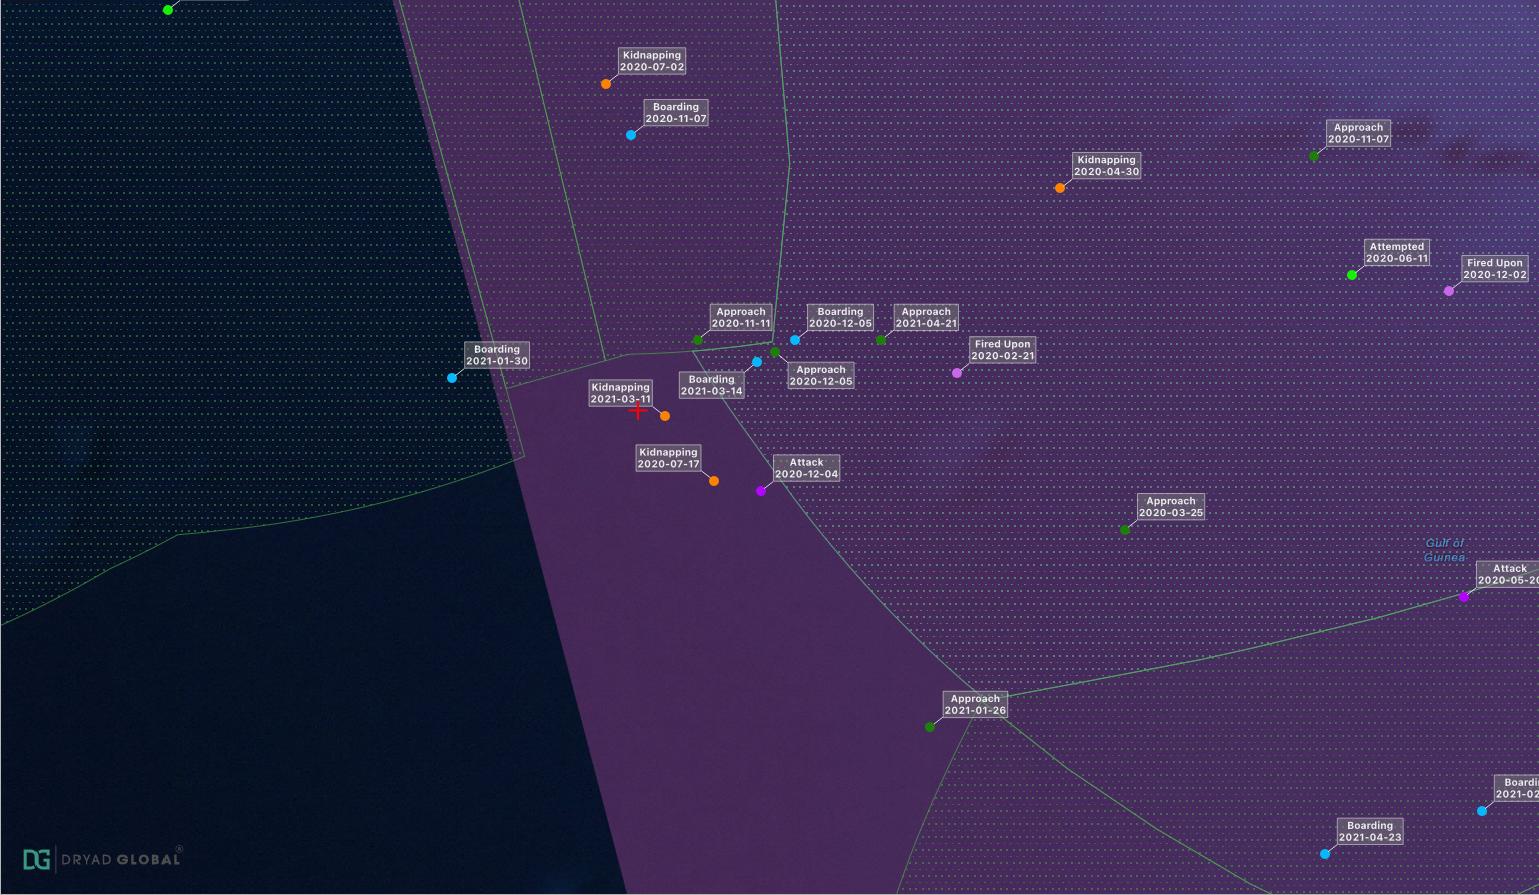 Approach-210nm-S-Cotonou-2